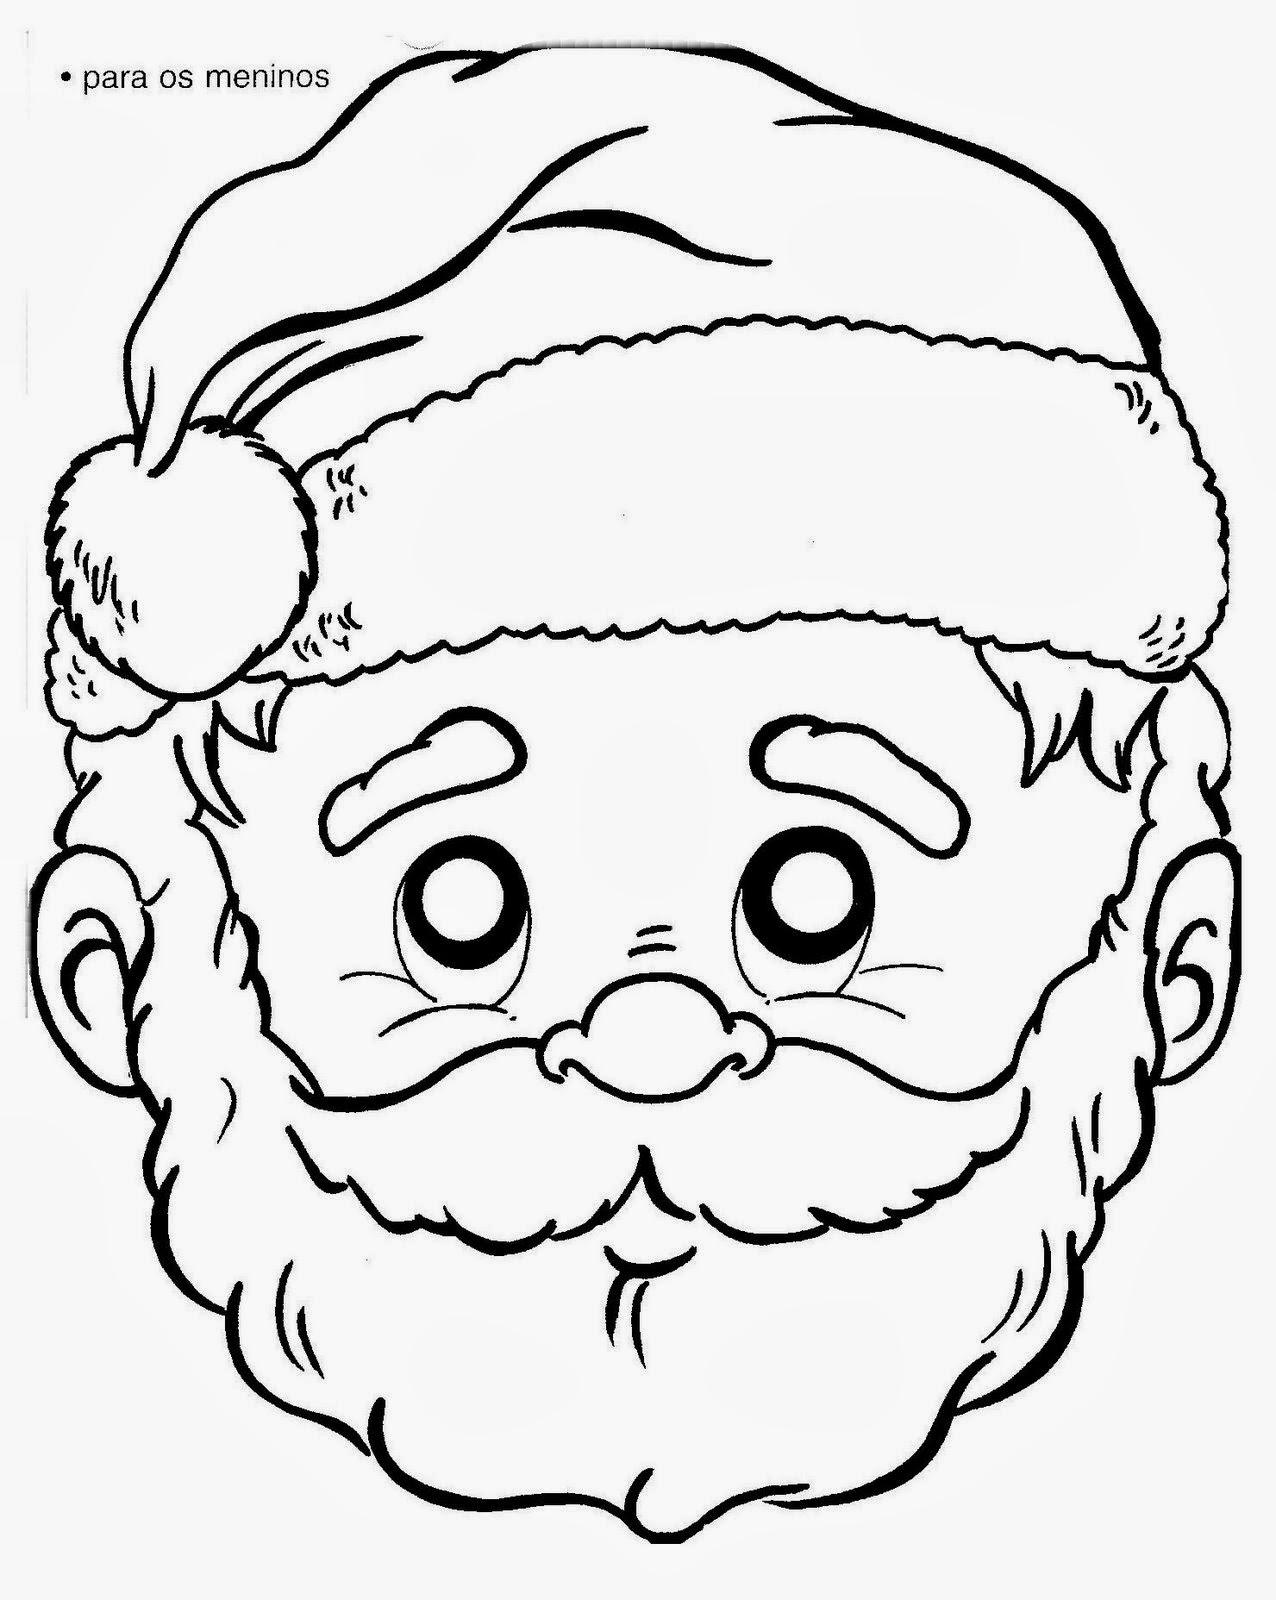 Mascara De Papai Noel E Mamae Noel Imprimir Recortar E Pintar